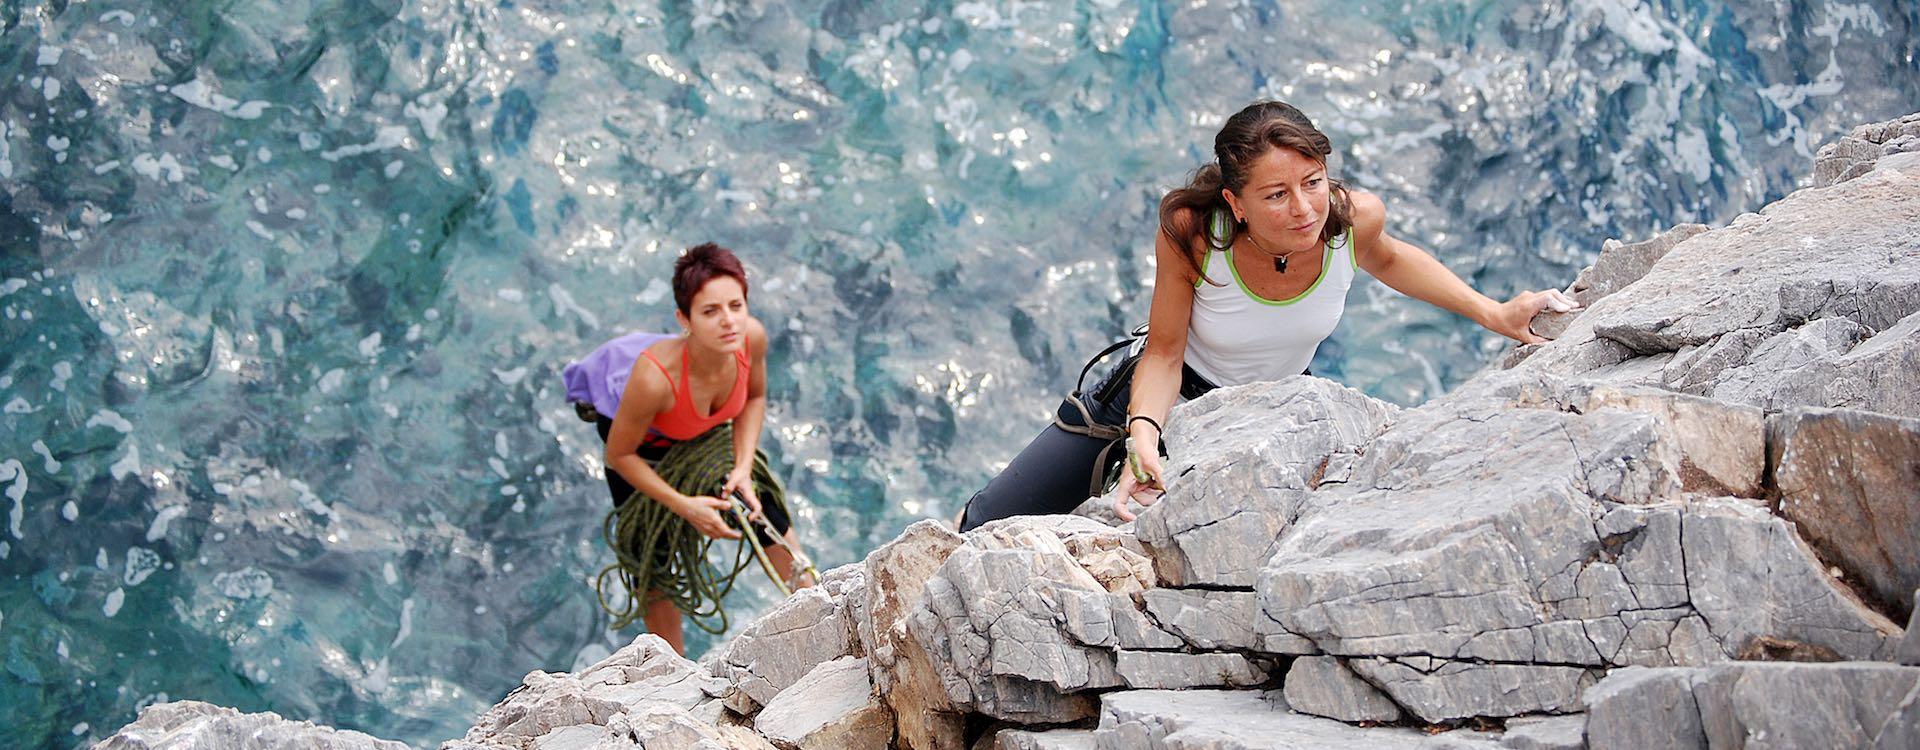 sports360-climbing-finale-ligure-20 (1).